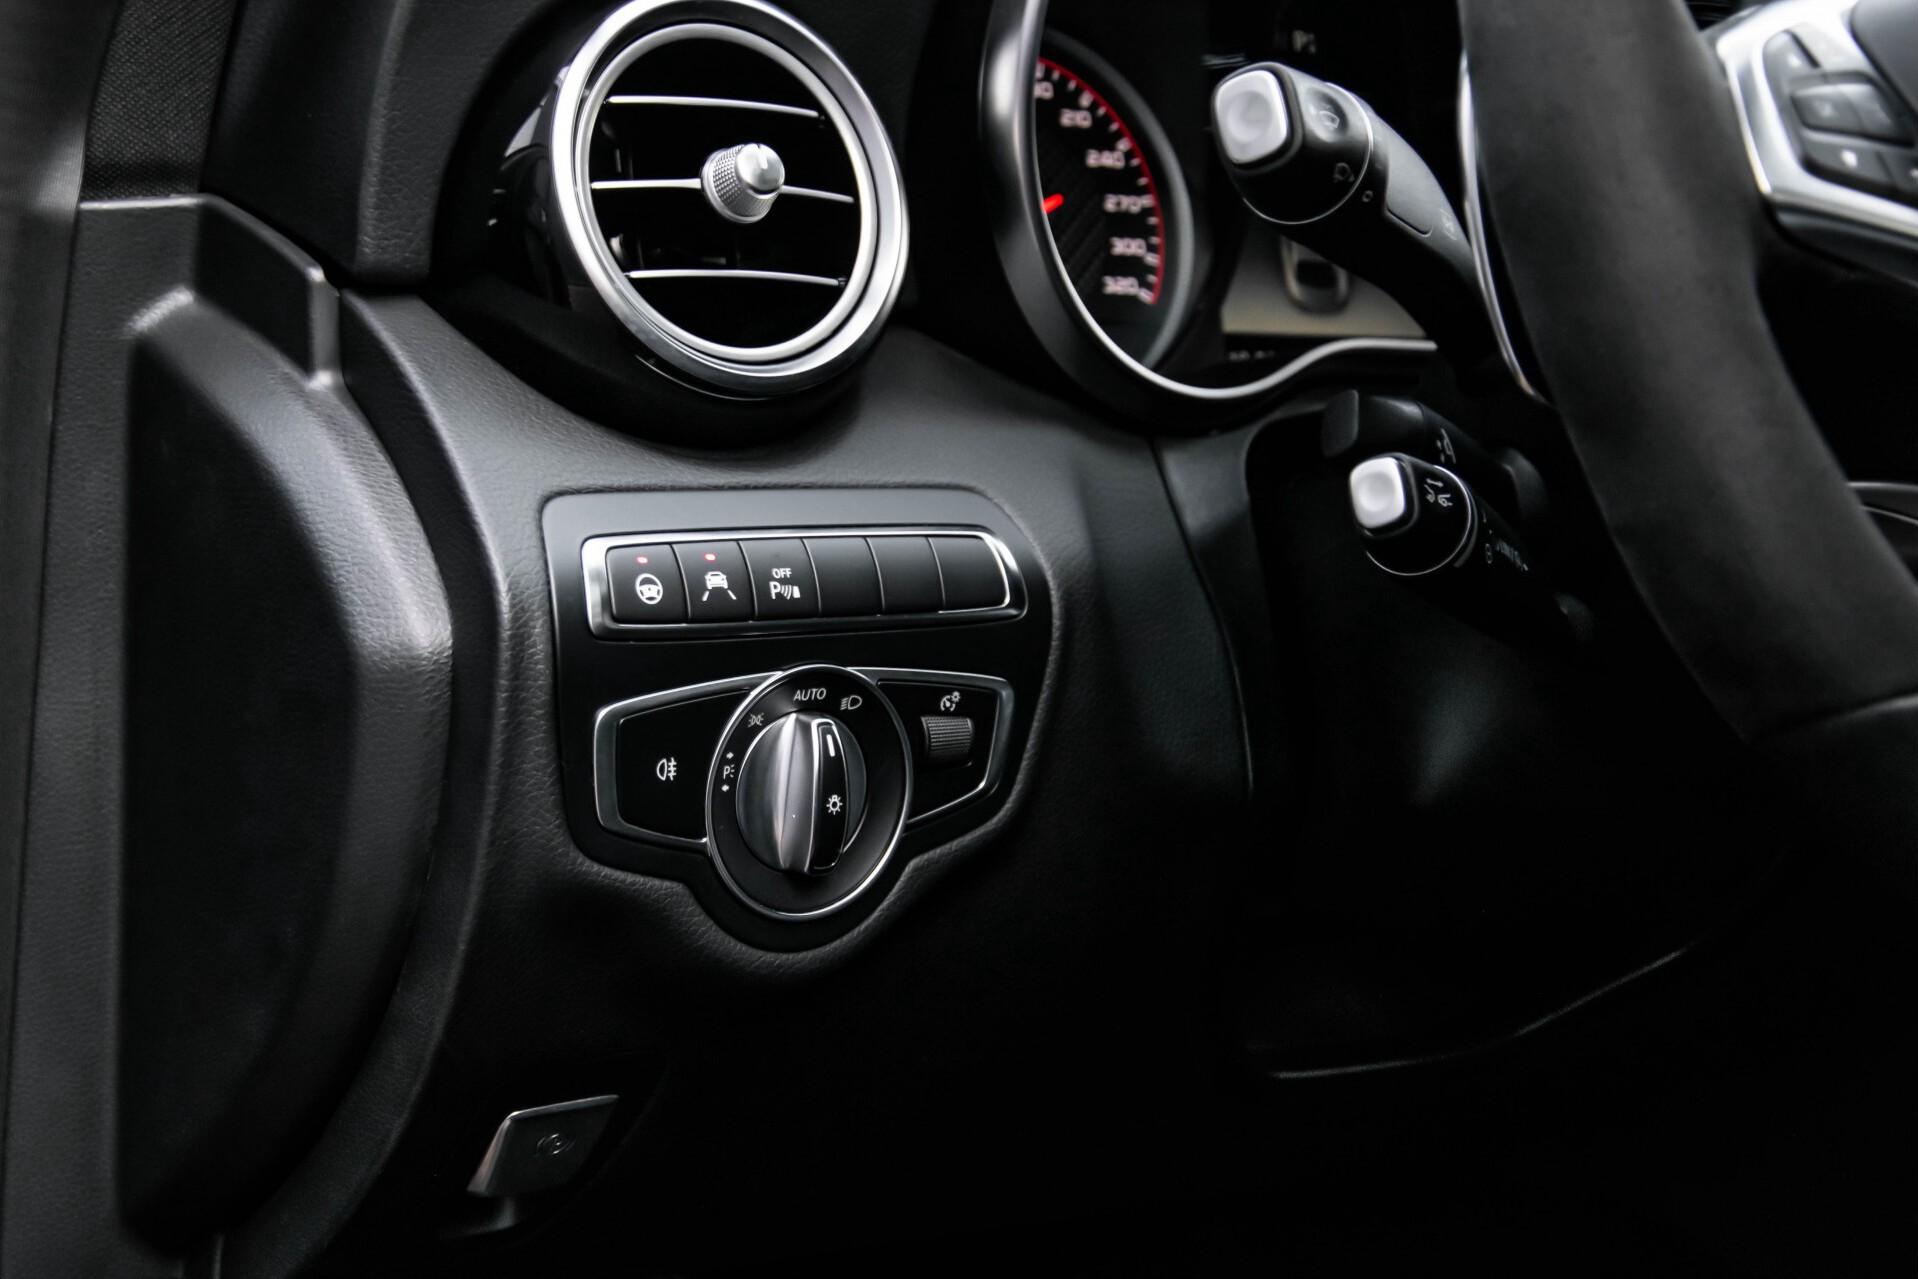 Mercedes-Benz C-Klasse 63 AMG S Panorama/Distronic/Keyless/Comand/Camera/ILS Aut7 Foto 25